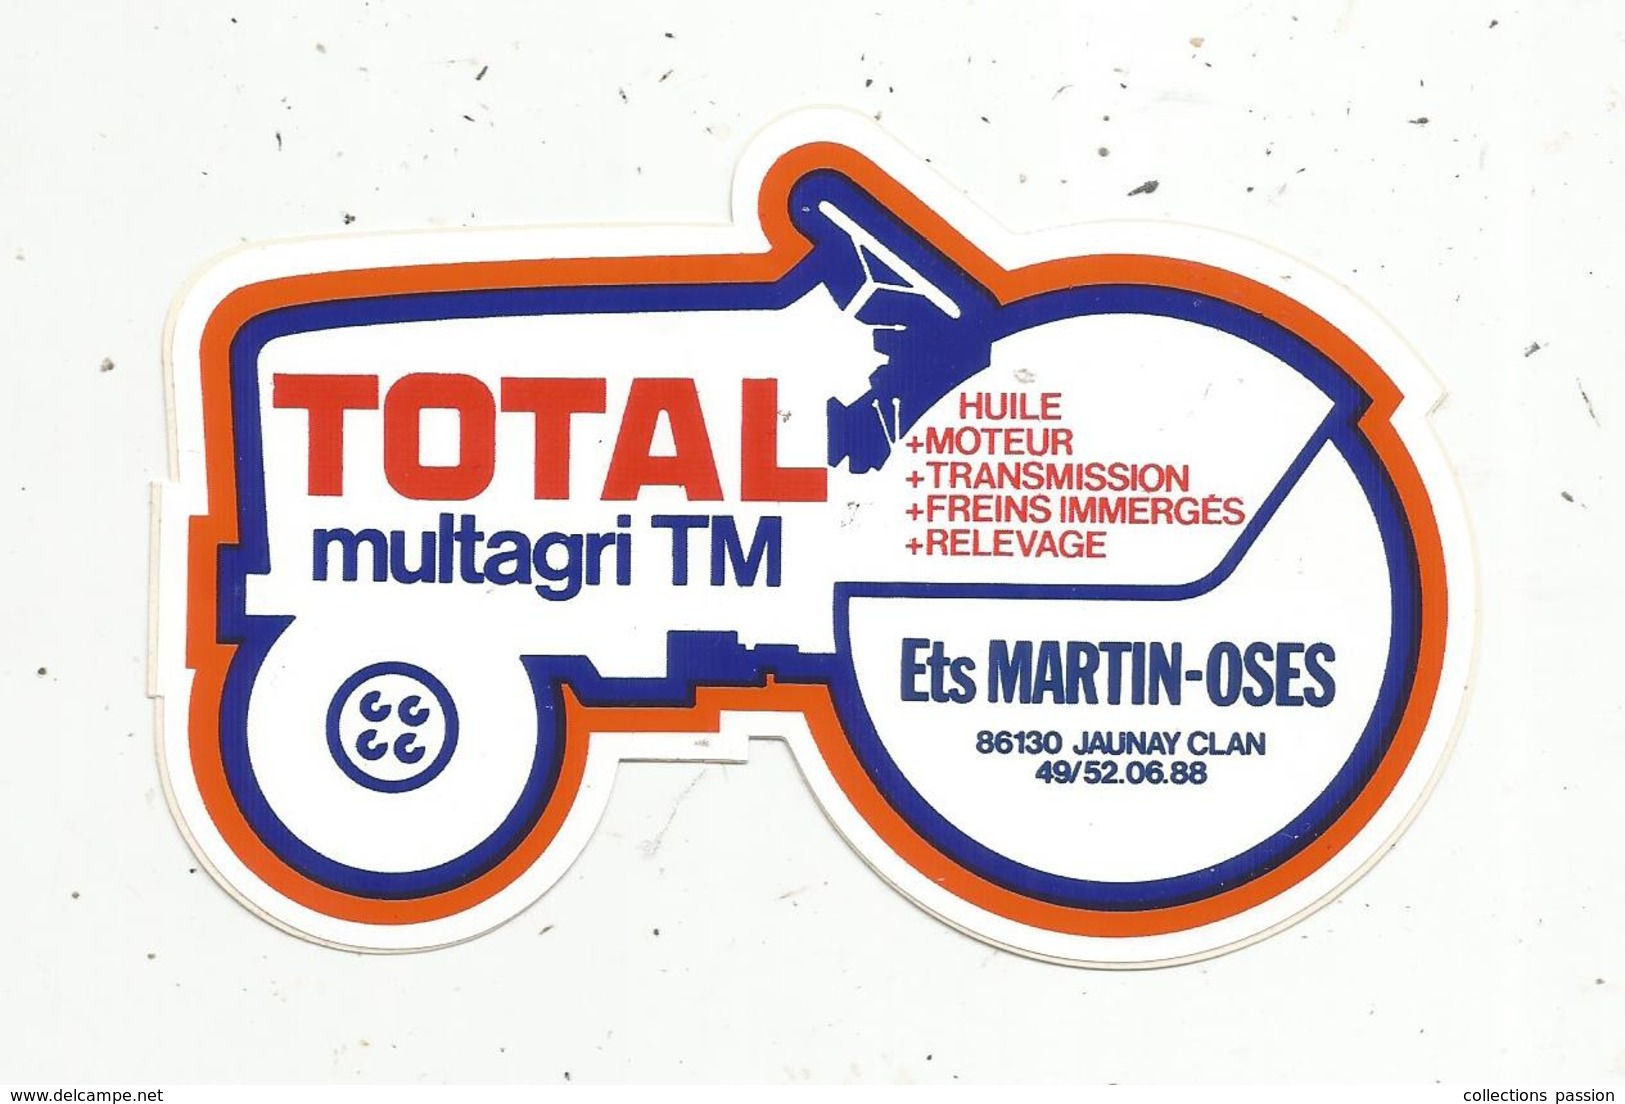 Autocollant , Automobile, Huile , TOTAL Multagri TM , Tracteur,  Ets MARTIN-OSES ,  86, JAUNAY CLAN - Autocollants